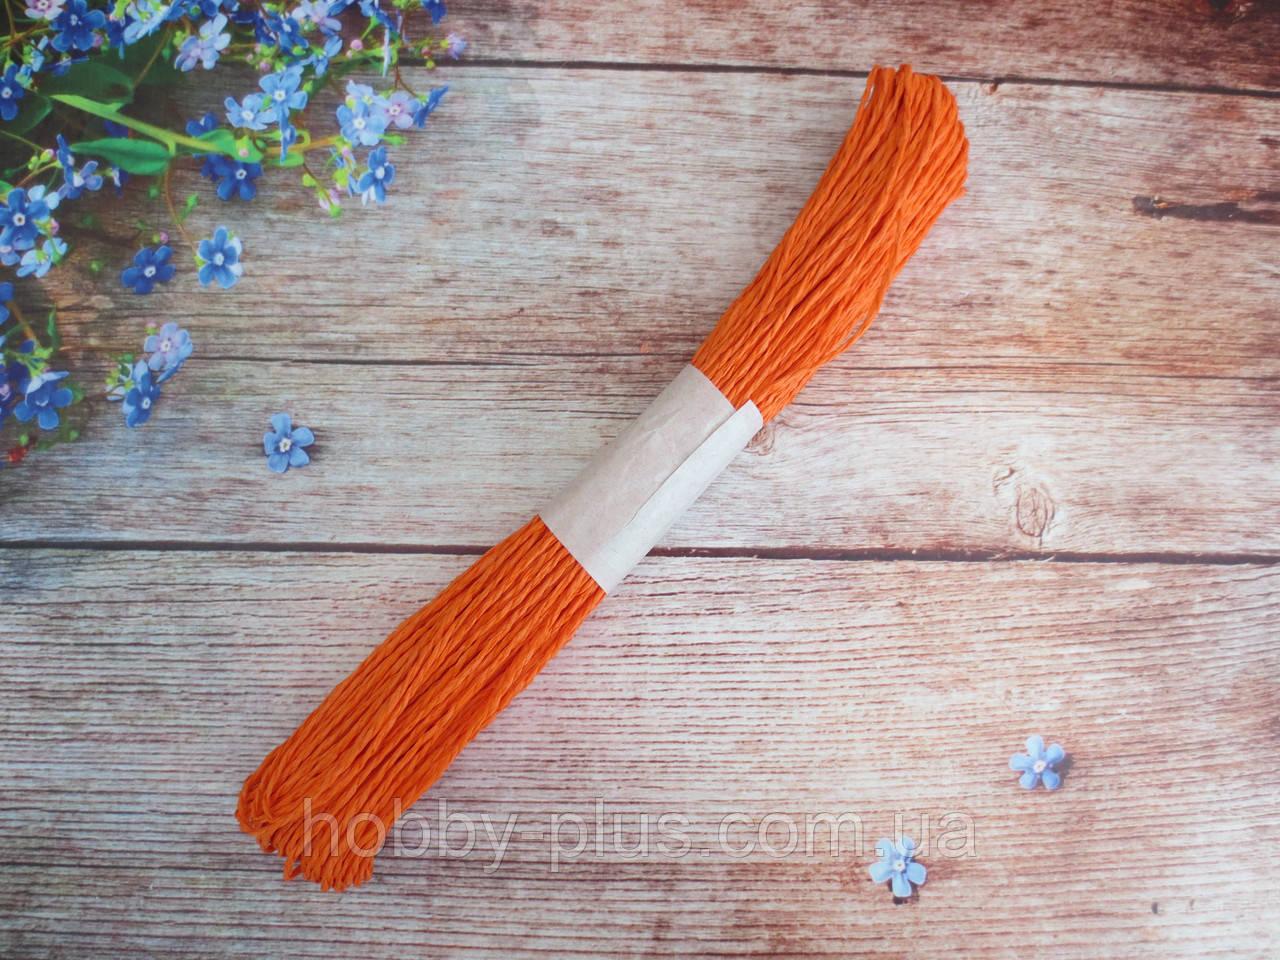 Шнур натуральный бумажный, d 2 мм, цвет оранжевый, 50 м